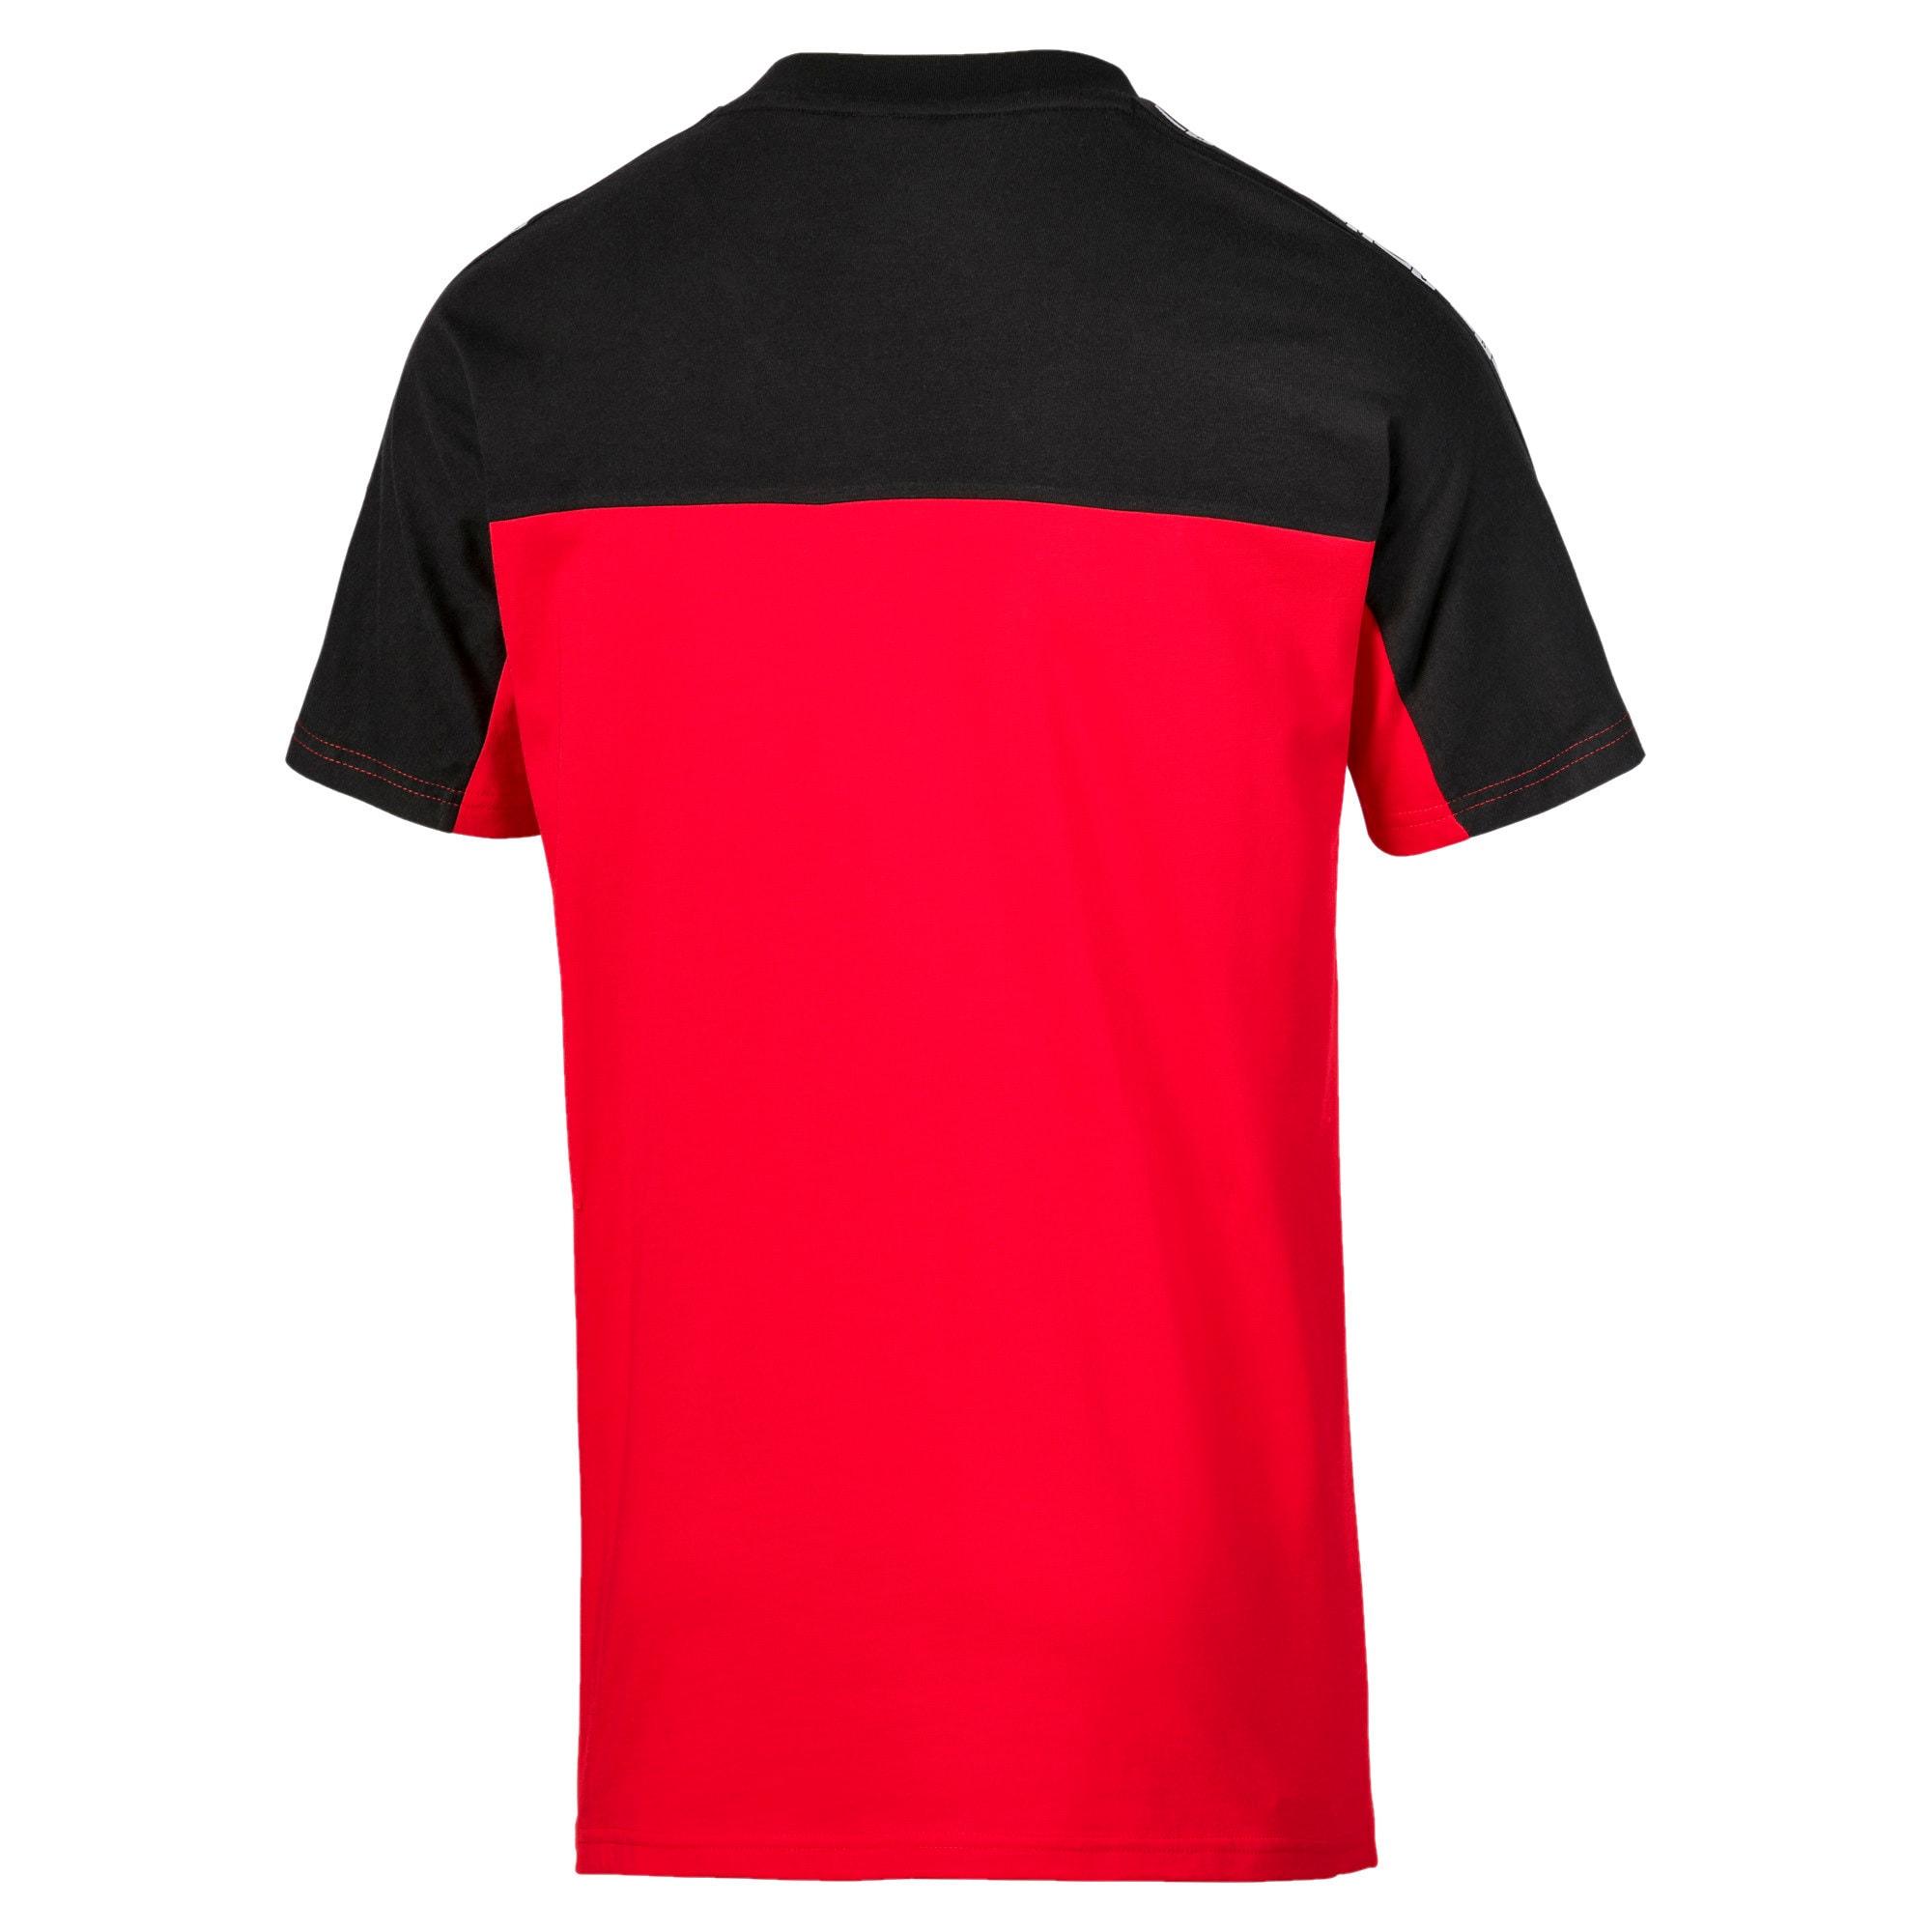 Thumbnail 5 of PUMA XTG SS Tシャツ, High Risk Red, medium-JPN